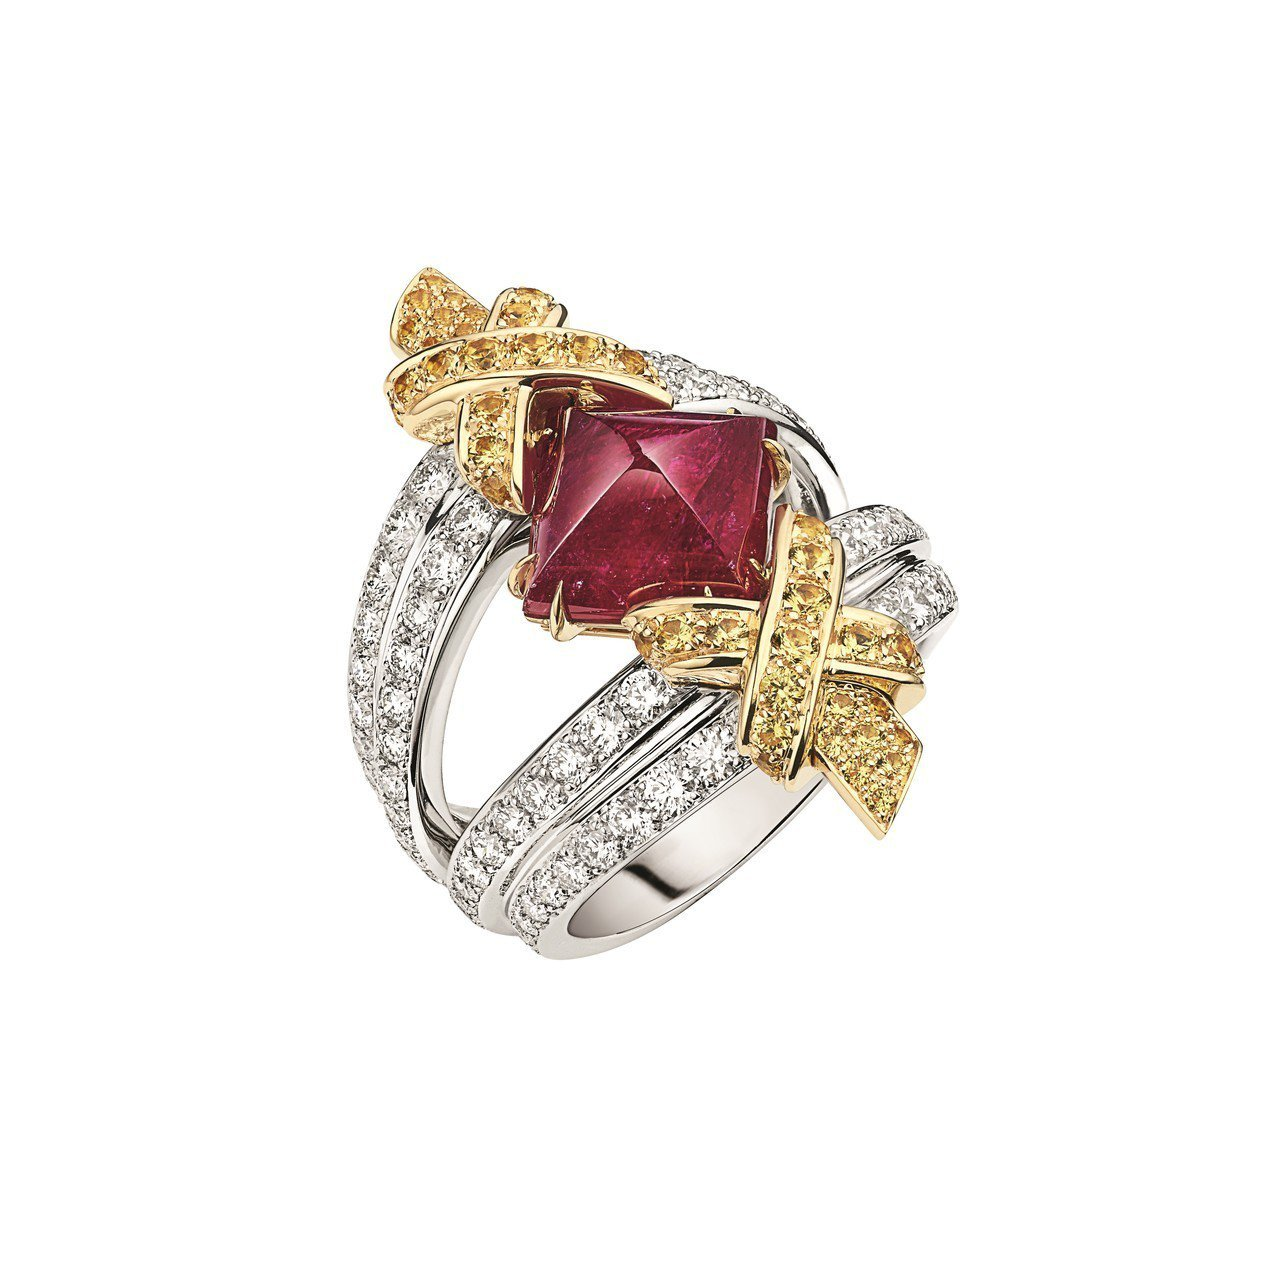 Terres d'or 金色大地系列戒指,18K白金和18K黃金鑲嵌糖塊切割西非...